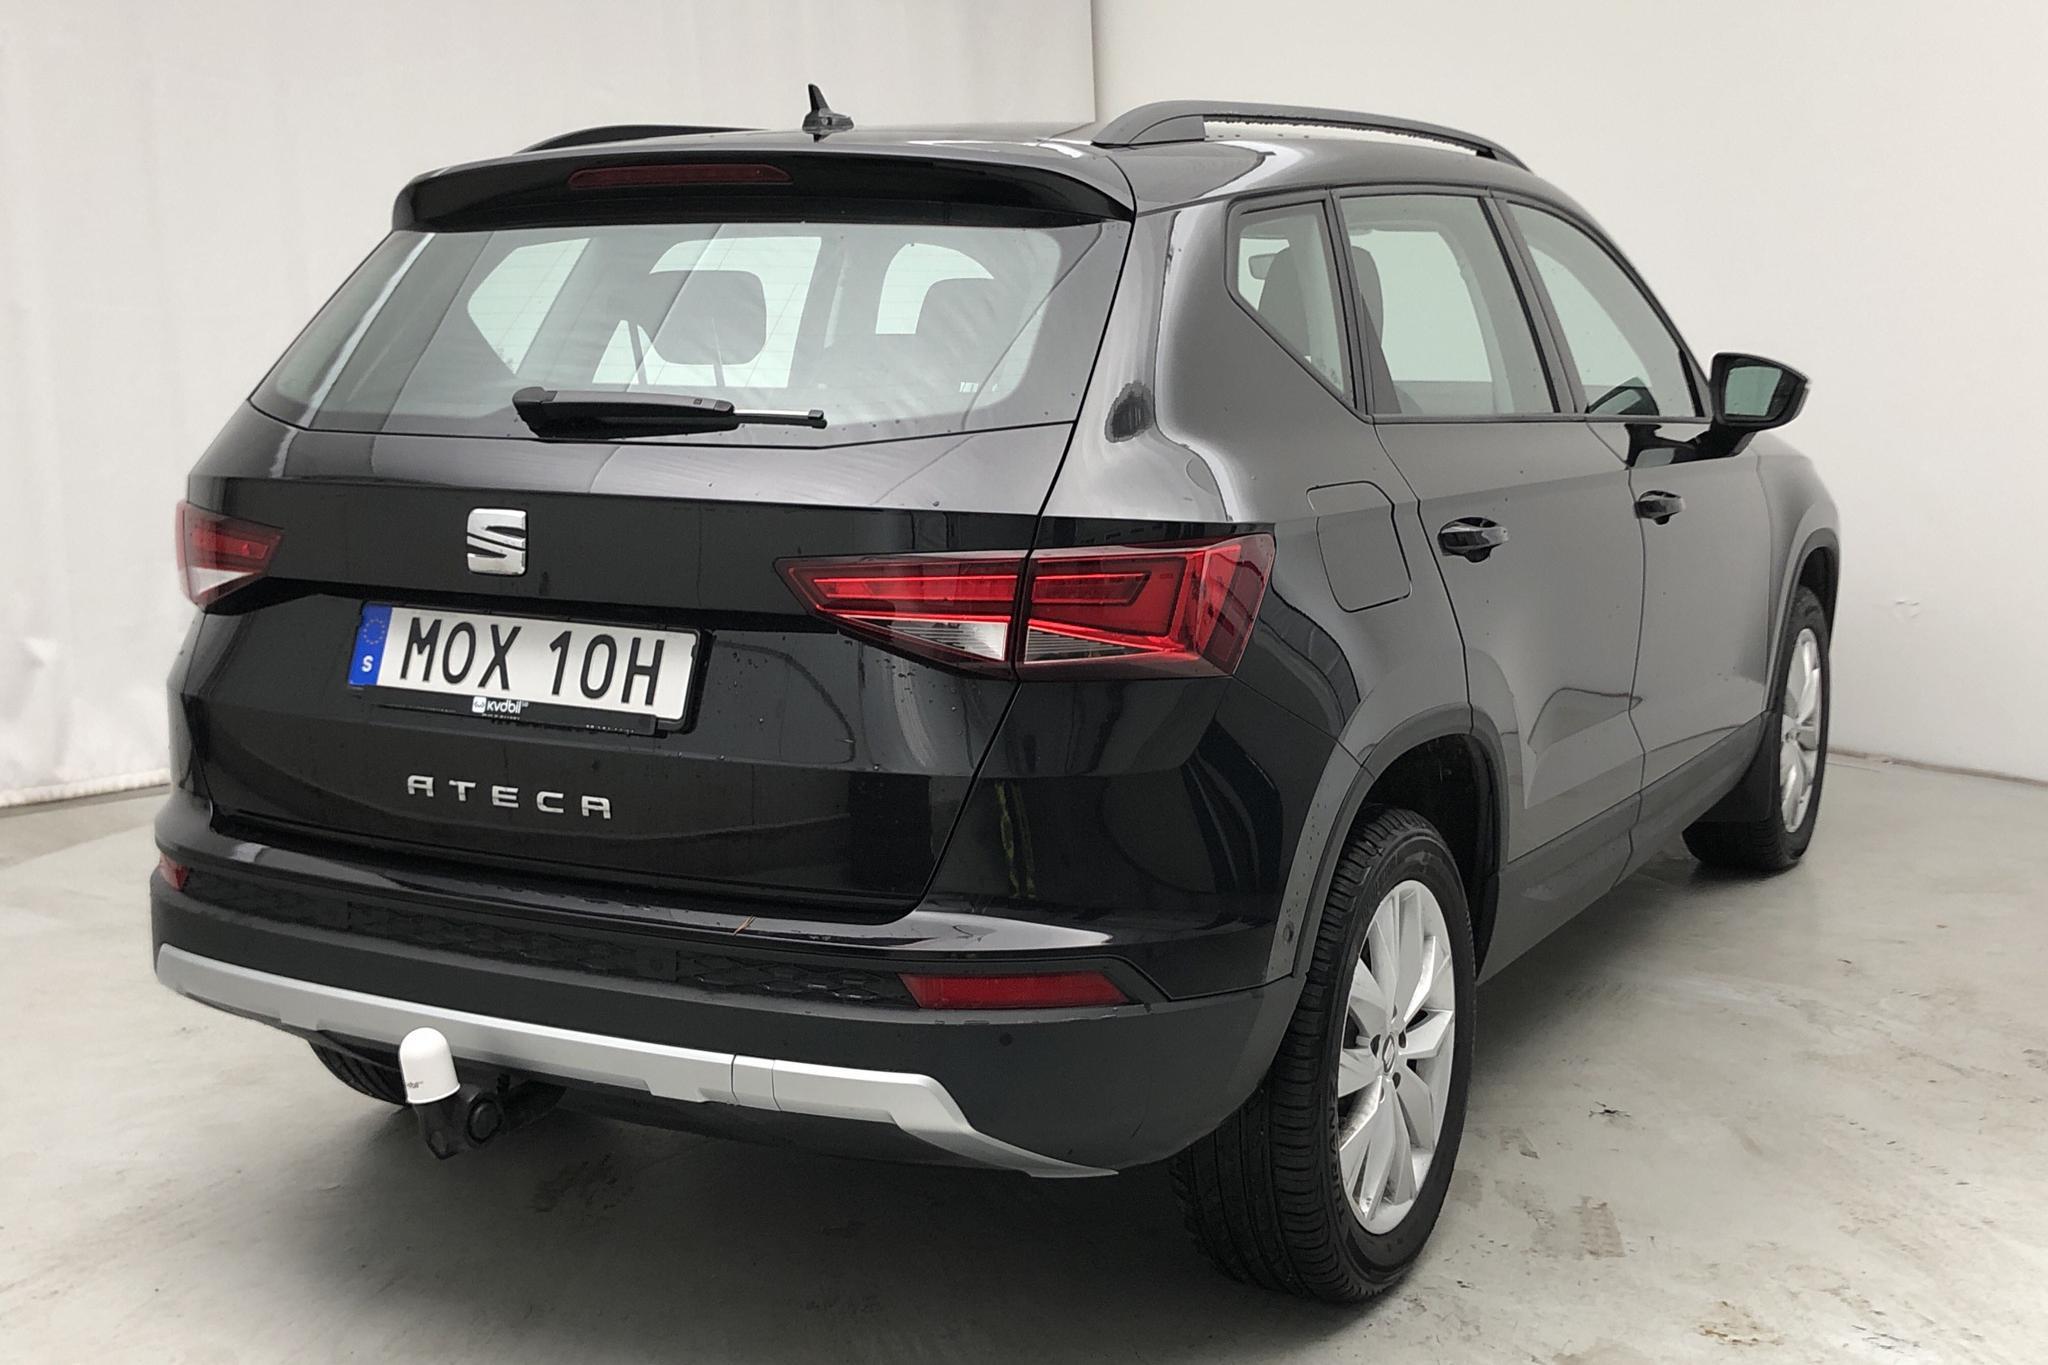 Seat Ateca 1.6 TDI (115hk) - 900 mil - Manuell - svart - 2019